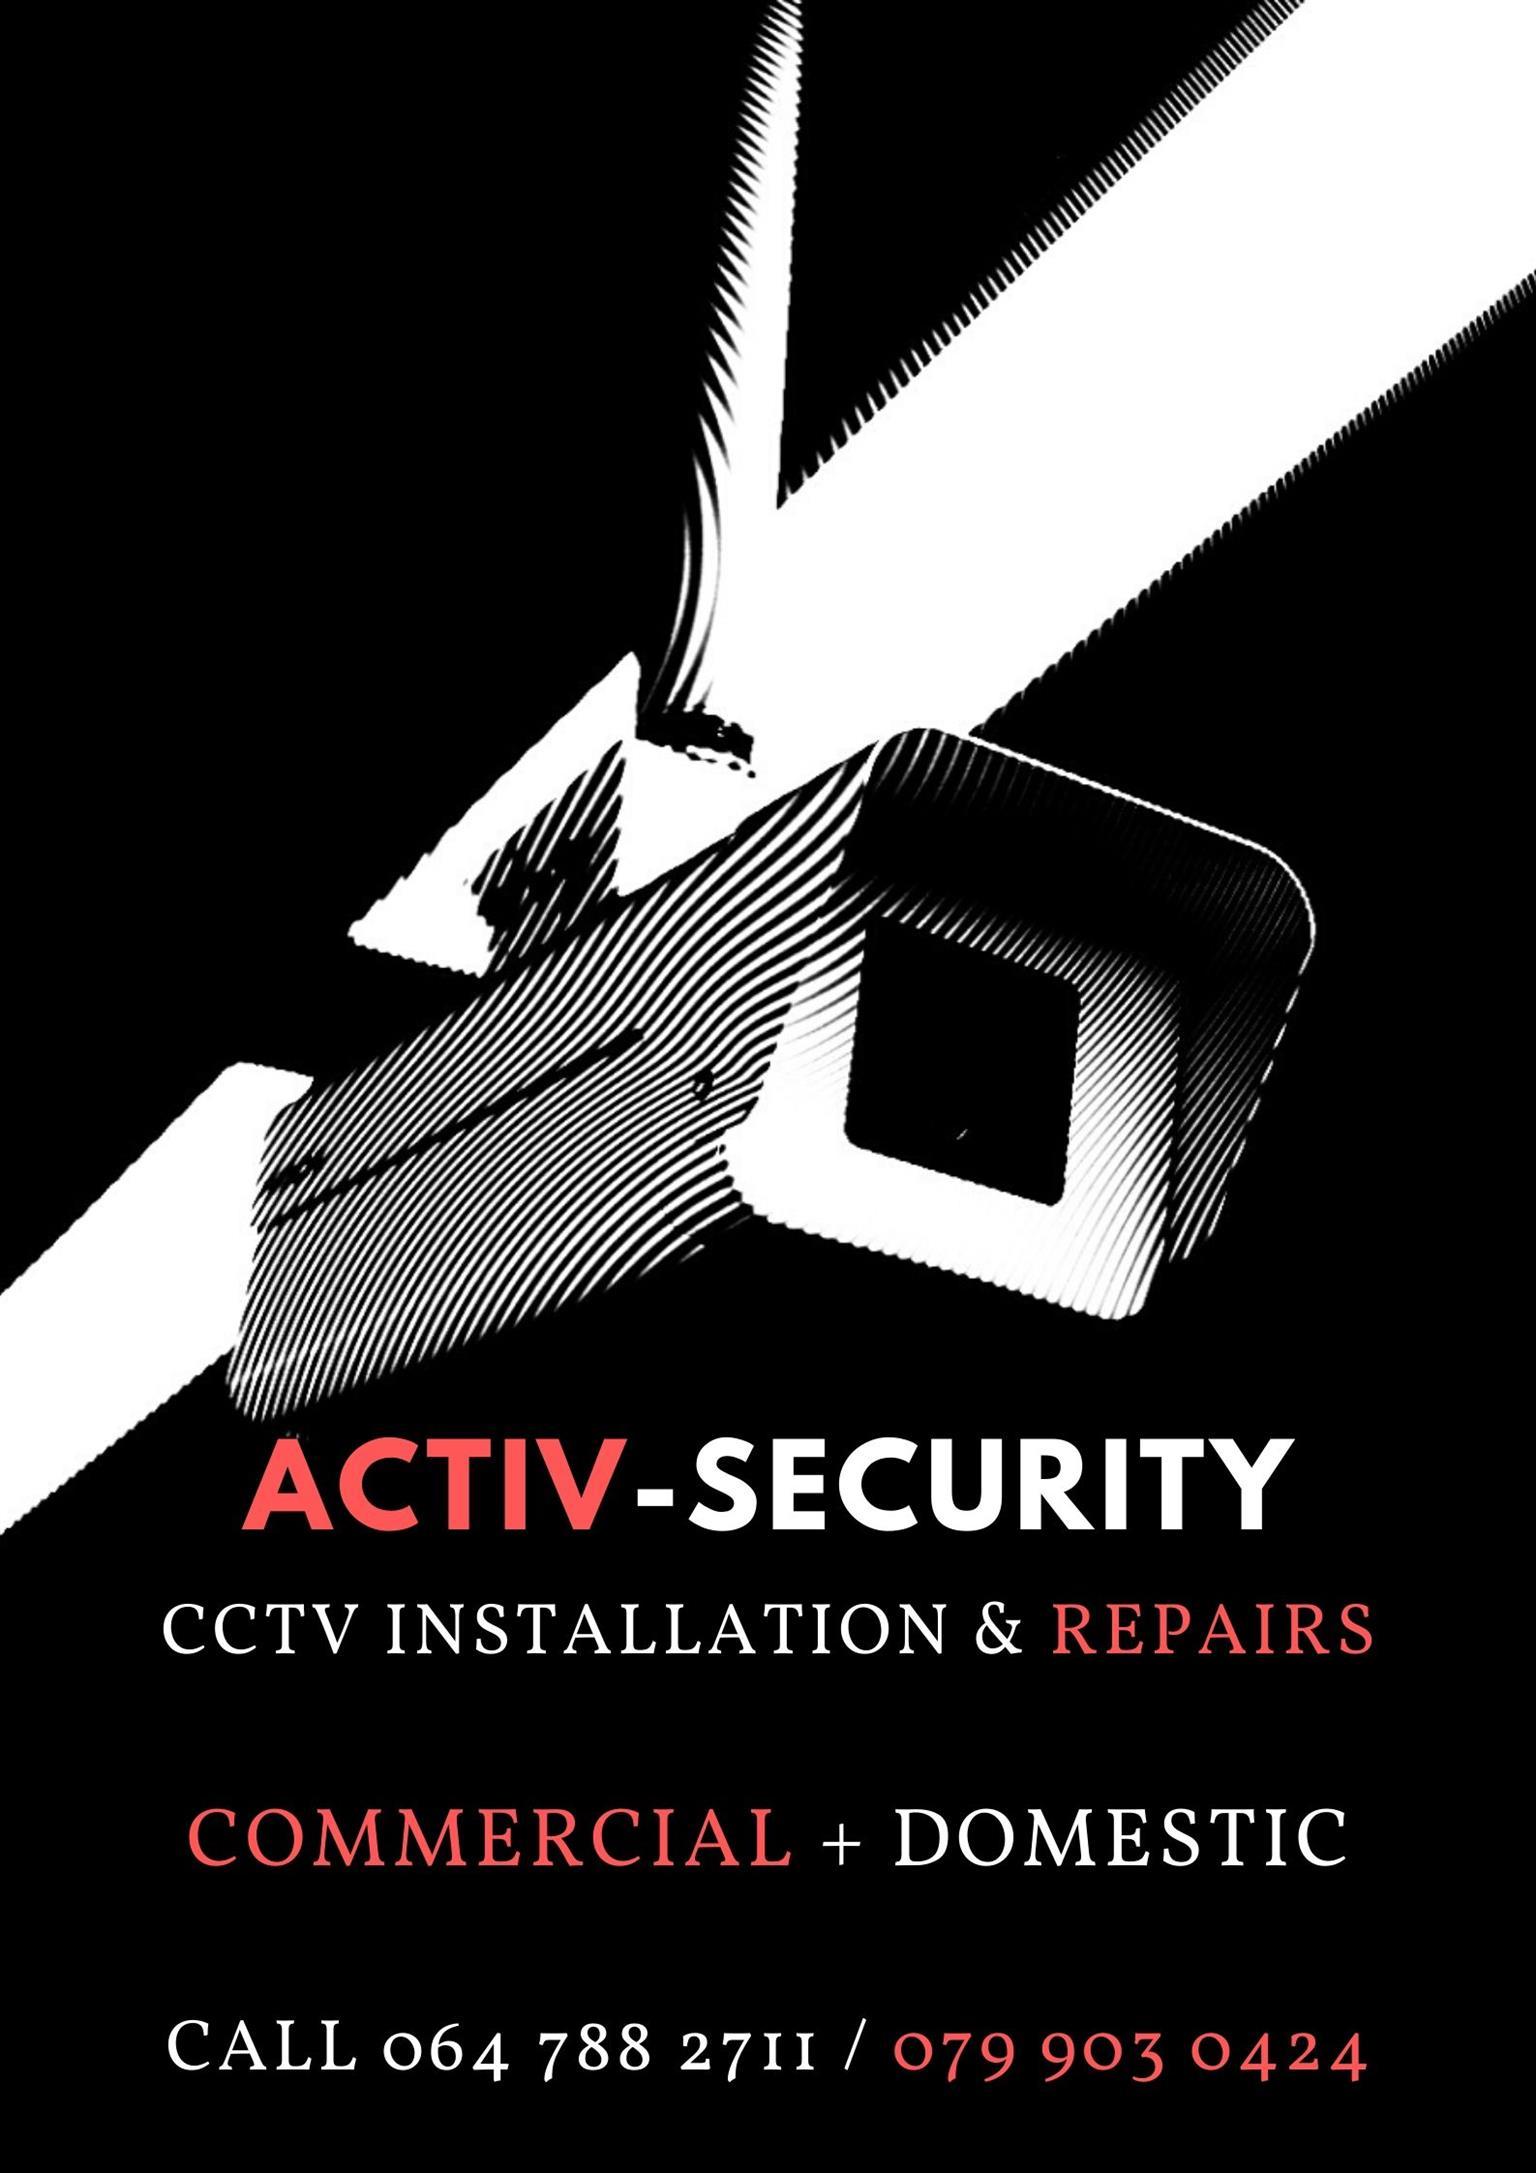 CCTV Installation & Maintenance Call 064 788 2711